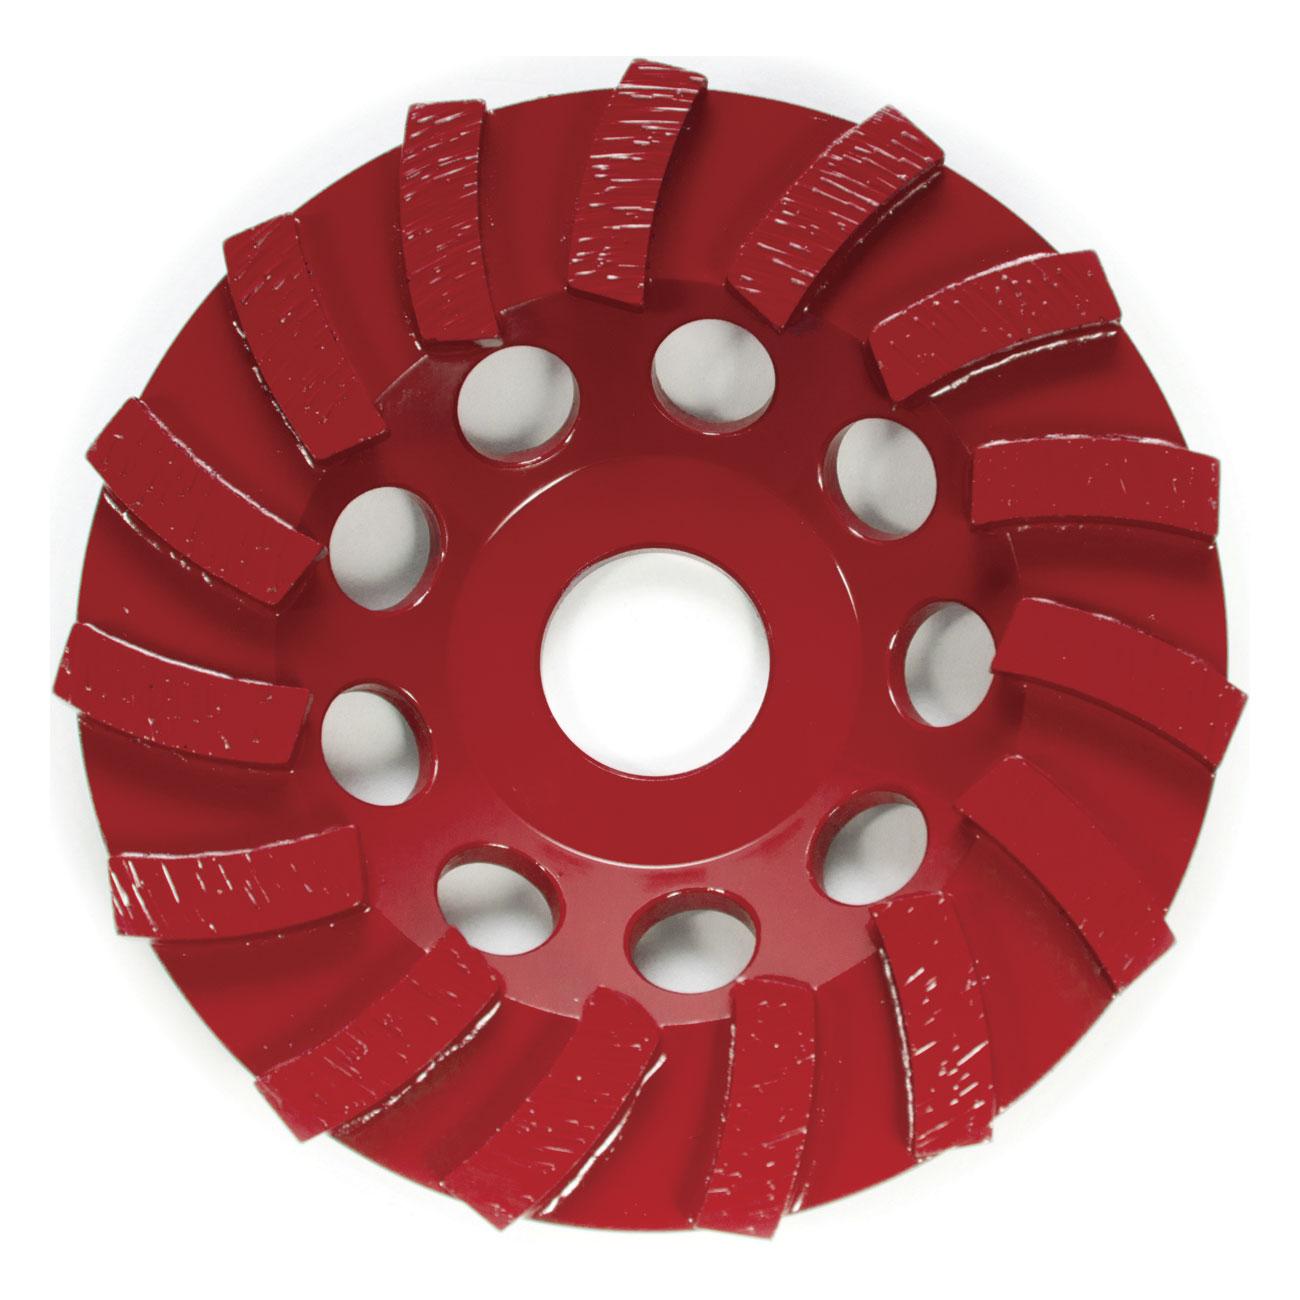 Diamond Grinding Disc. Grinding Cup Wheel Premier Range CTP